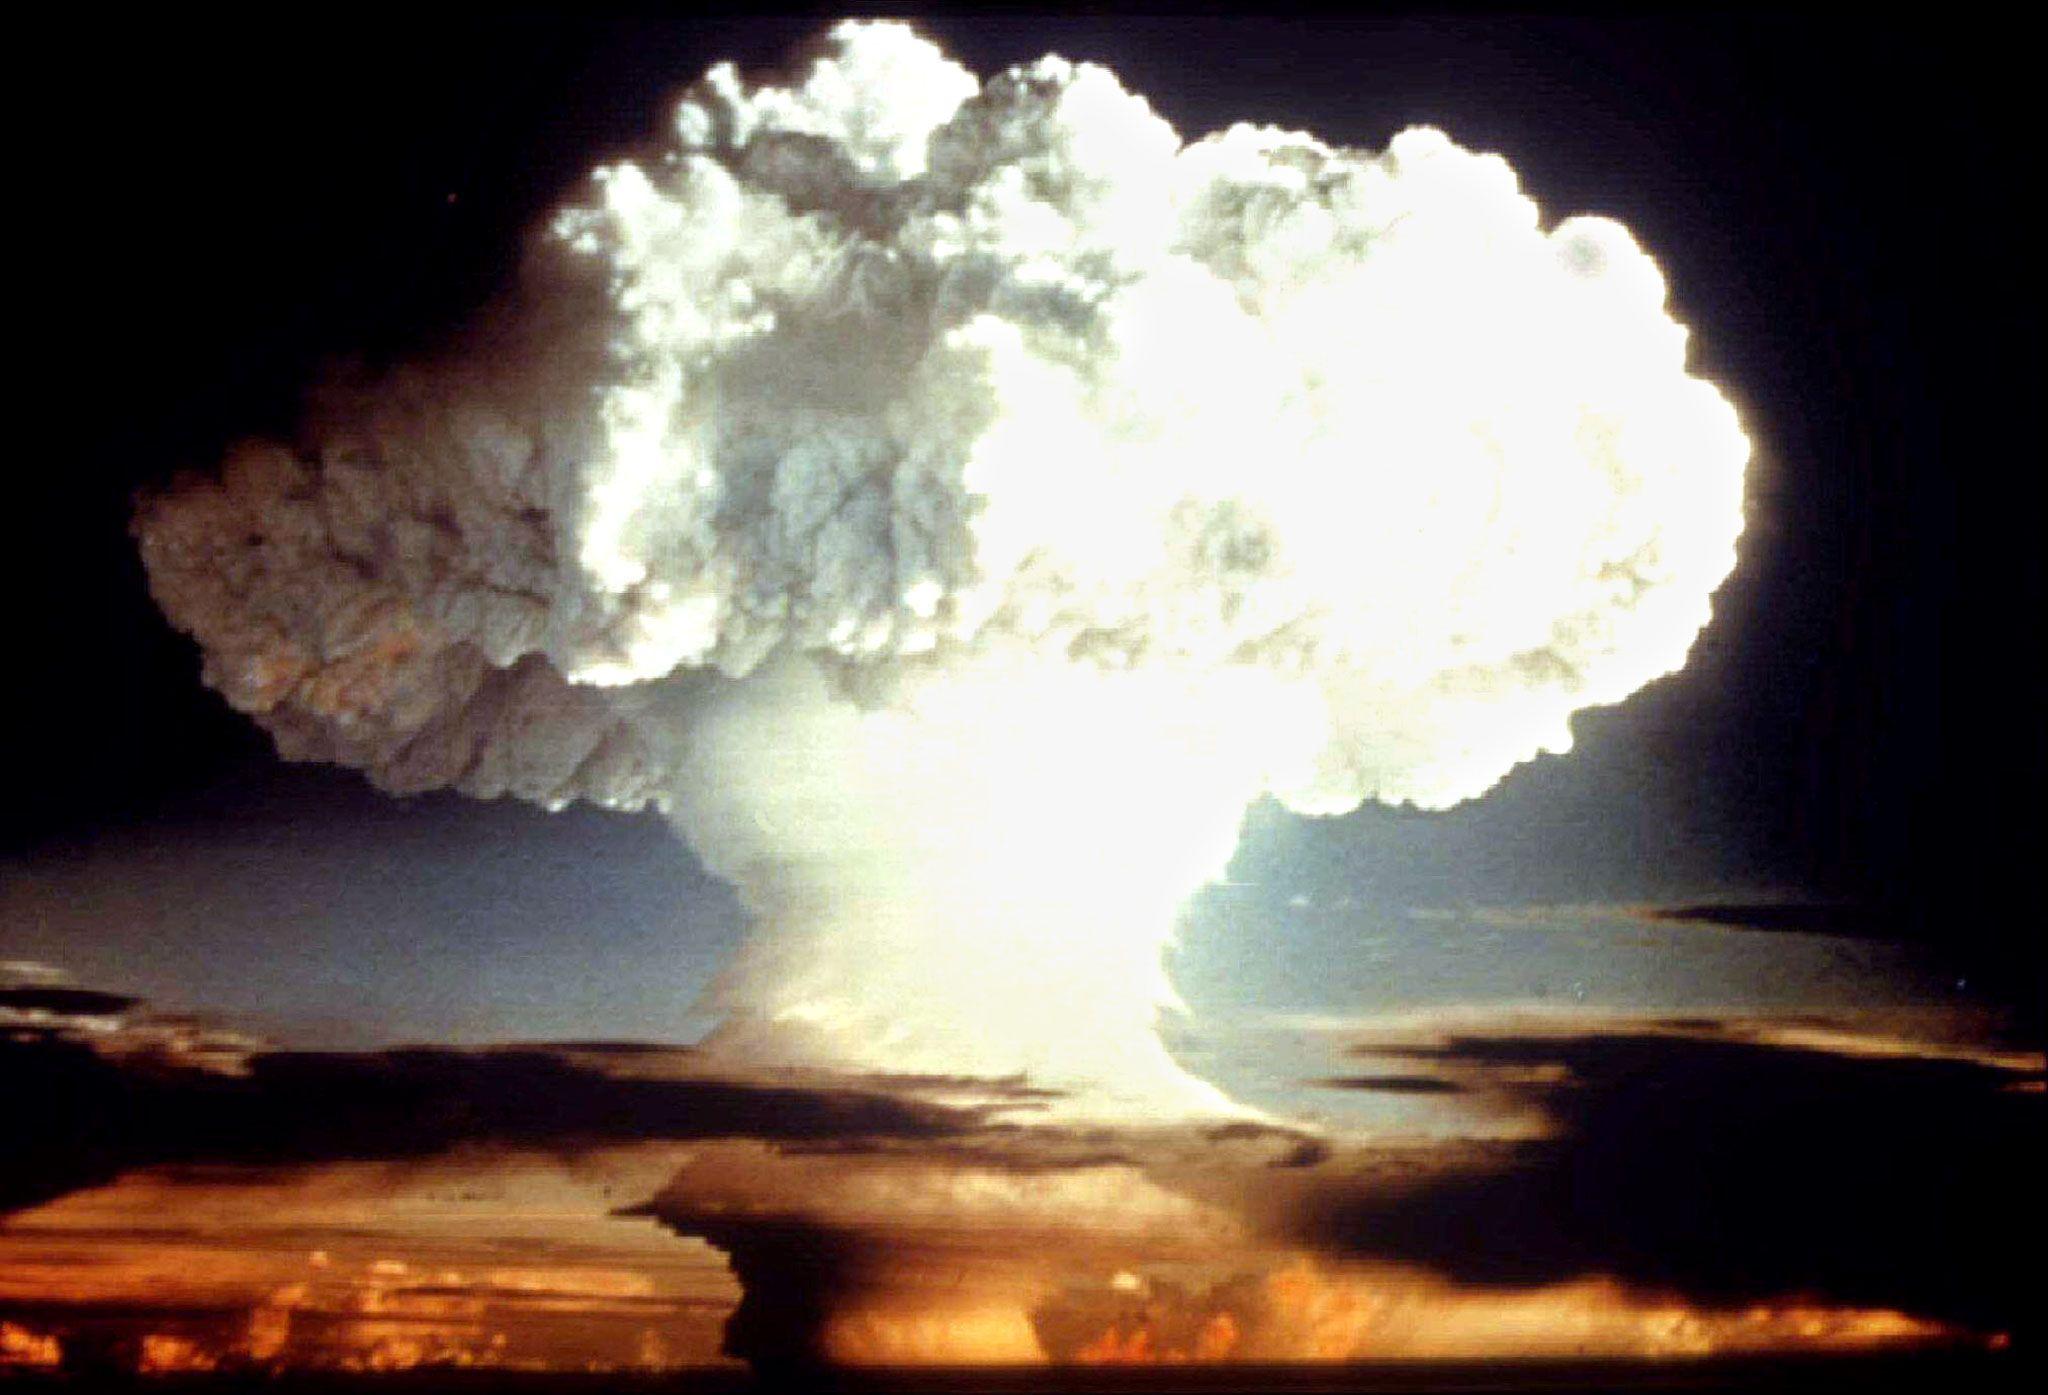 0811_atomic_explosion_north_korea_01